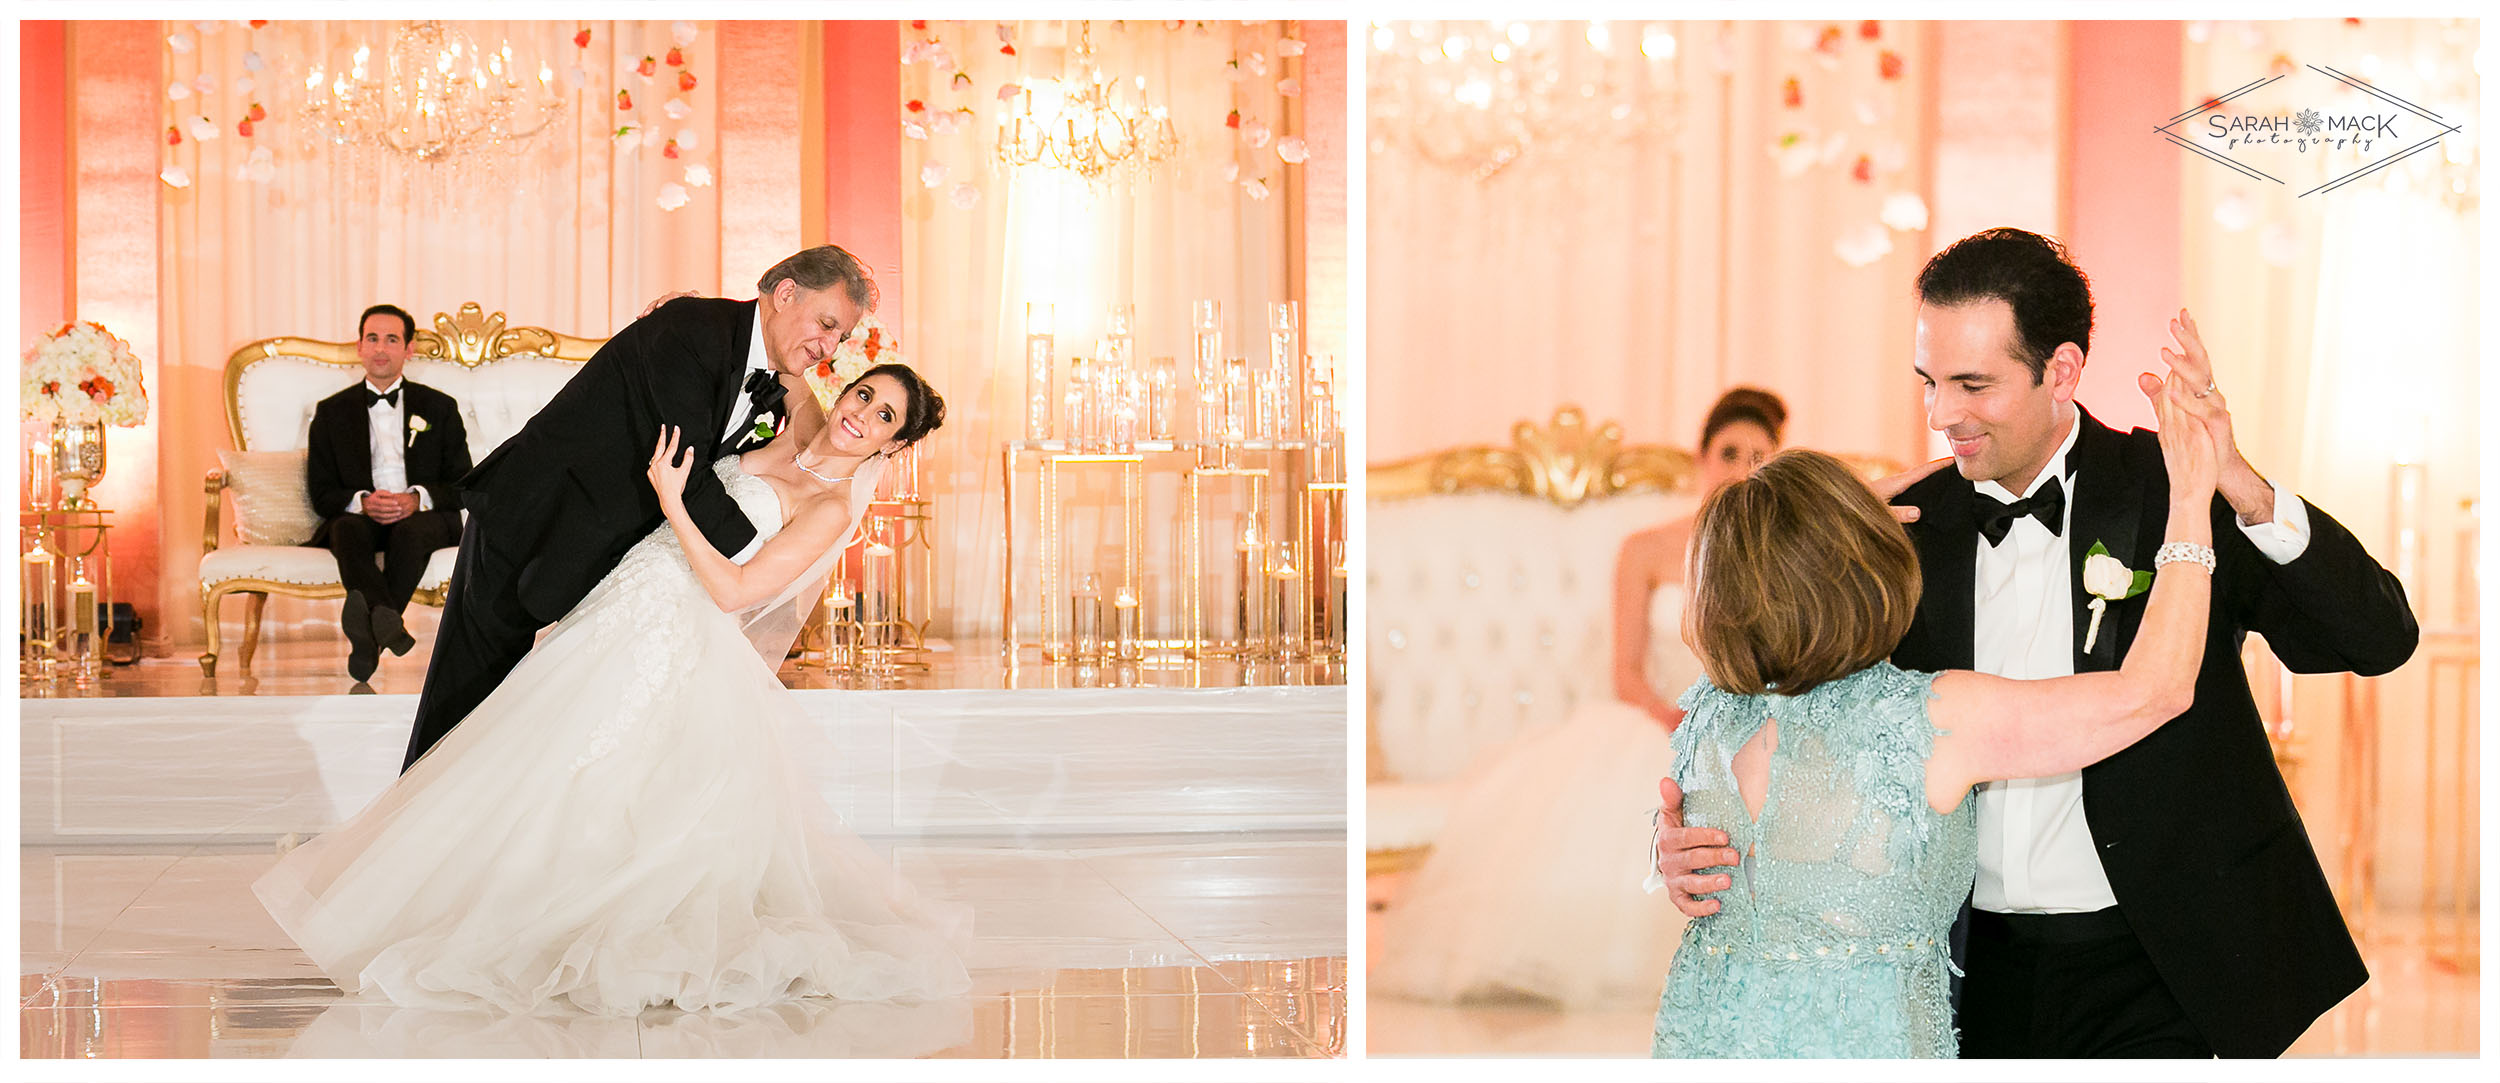 NJ-Newport-Beach-Marriott-Persian-Wedding-44.jpg